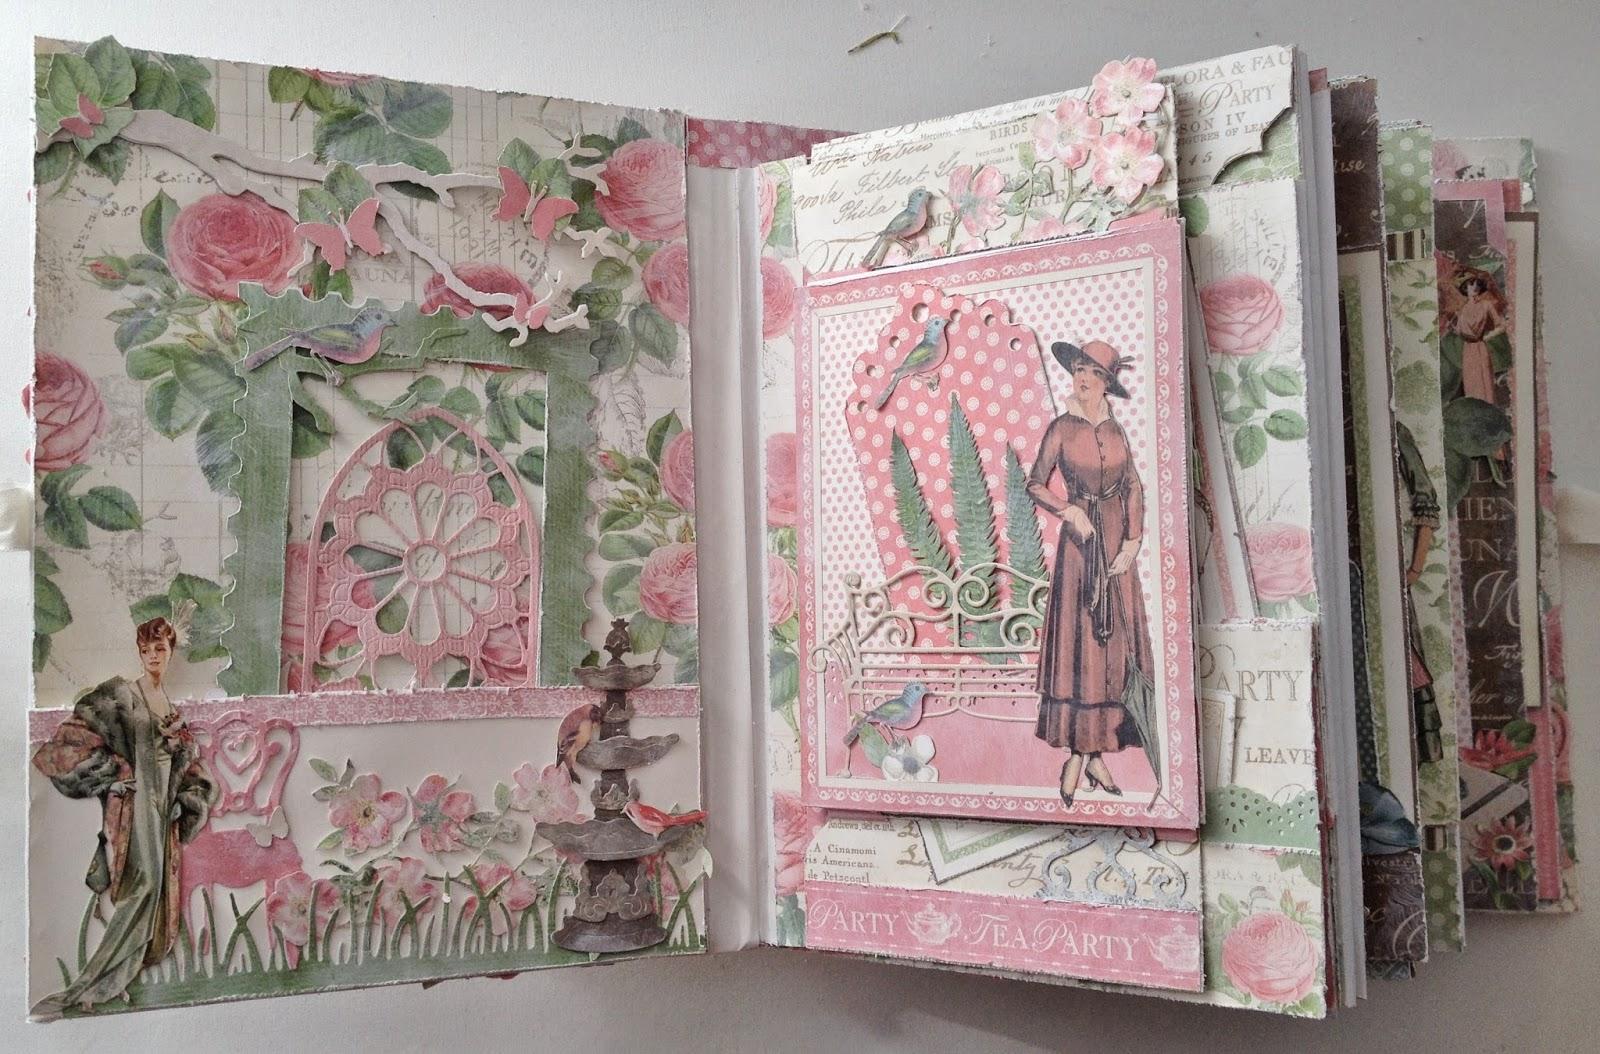 Scrapbook ideas abc album - G45 Botanical Tea Envelope Mini Album With Flaps Challenge With Linda At Livartnow